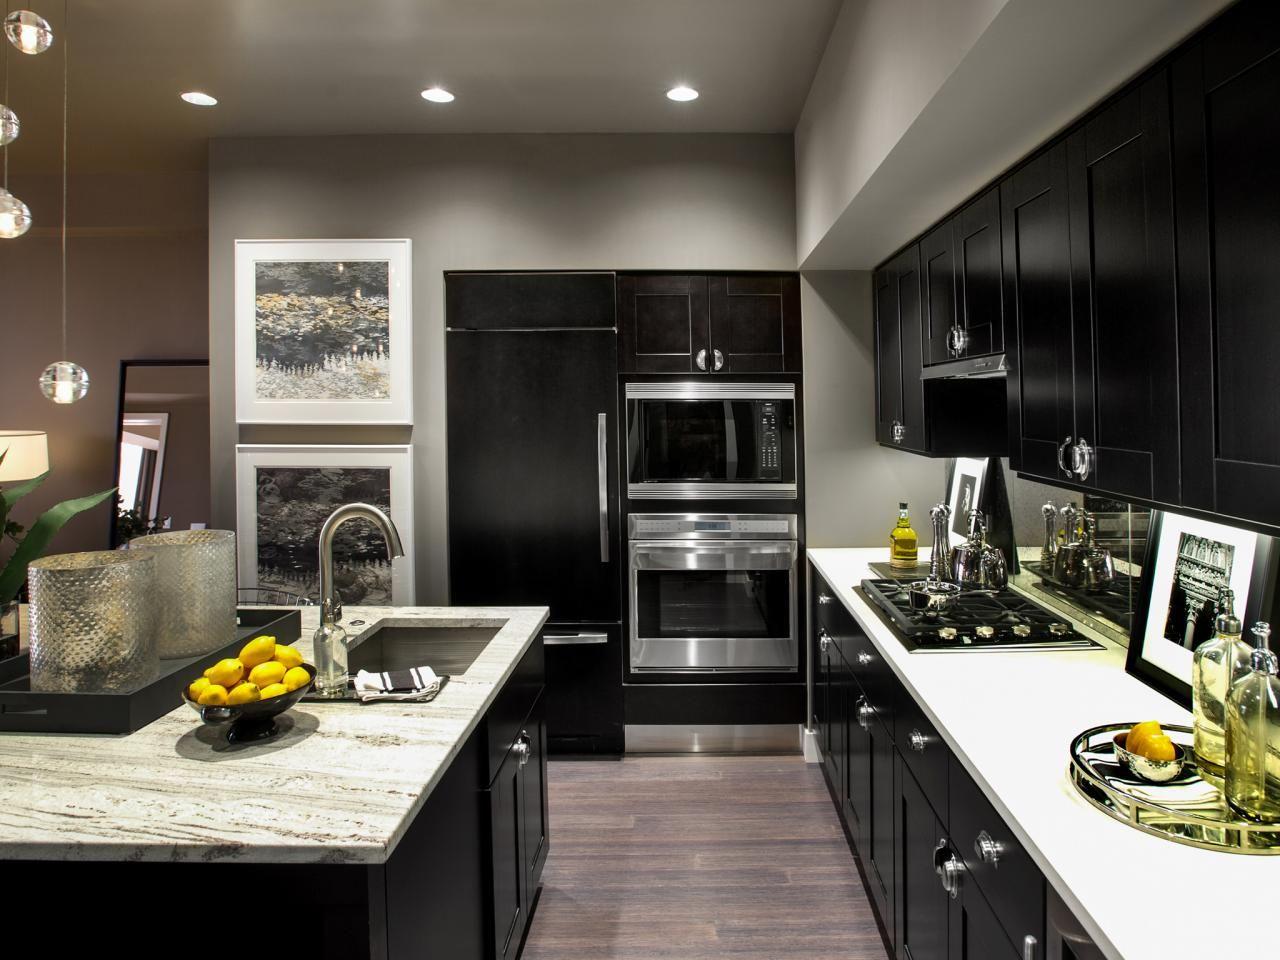 Which Kitchen is Your Favorite? | HGTV Urban Oasis